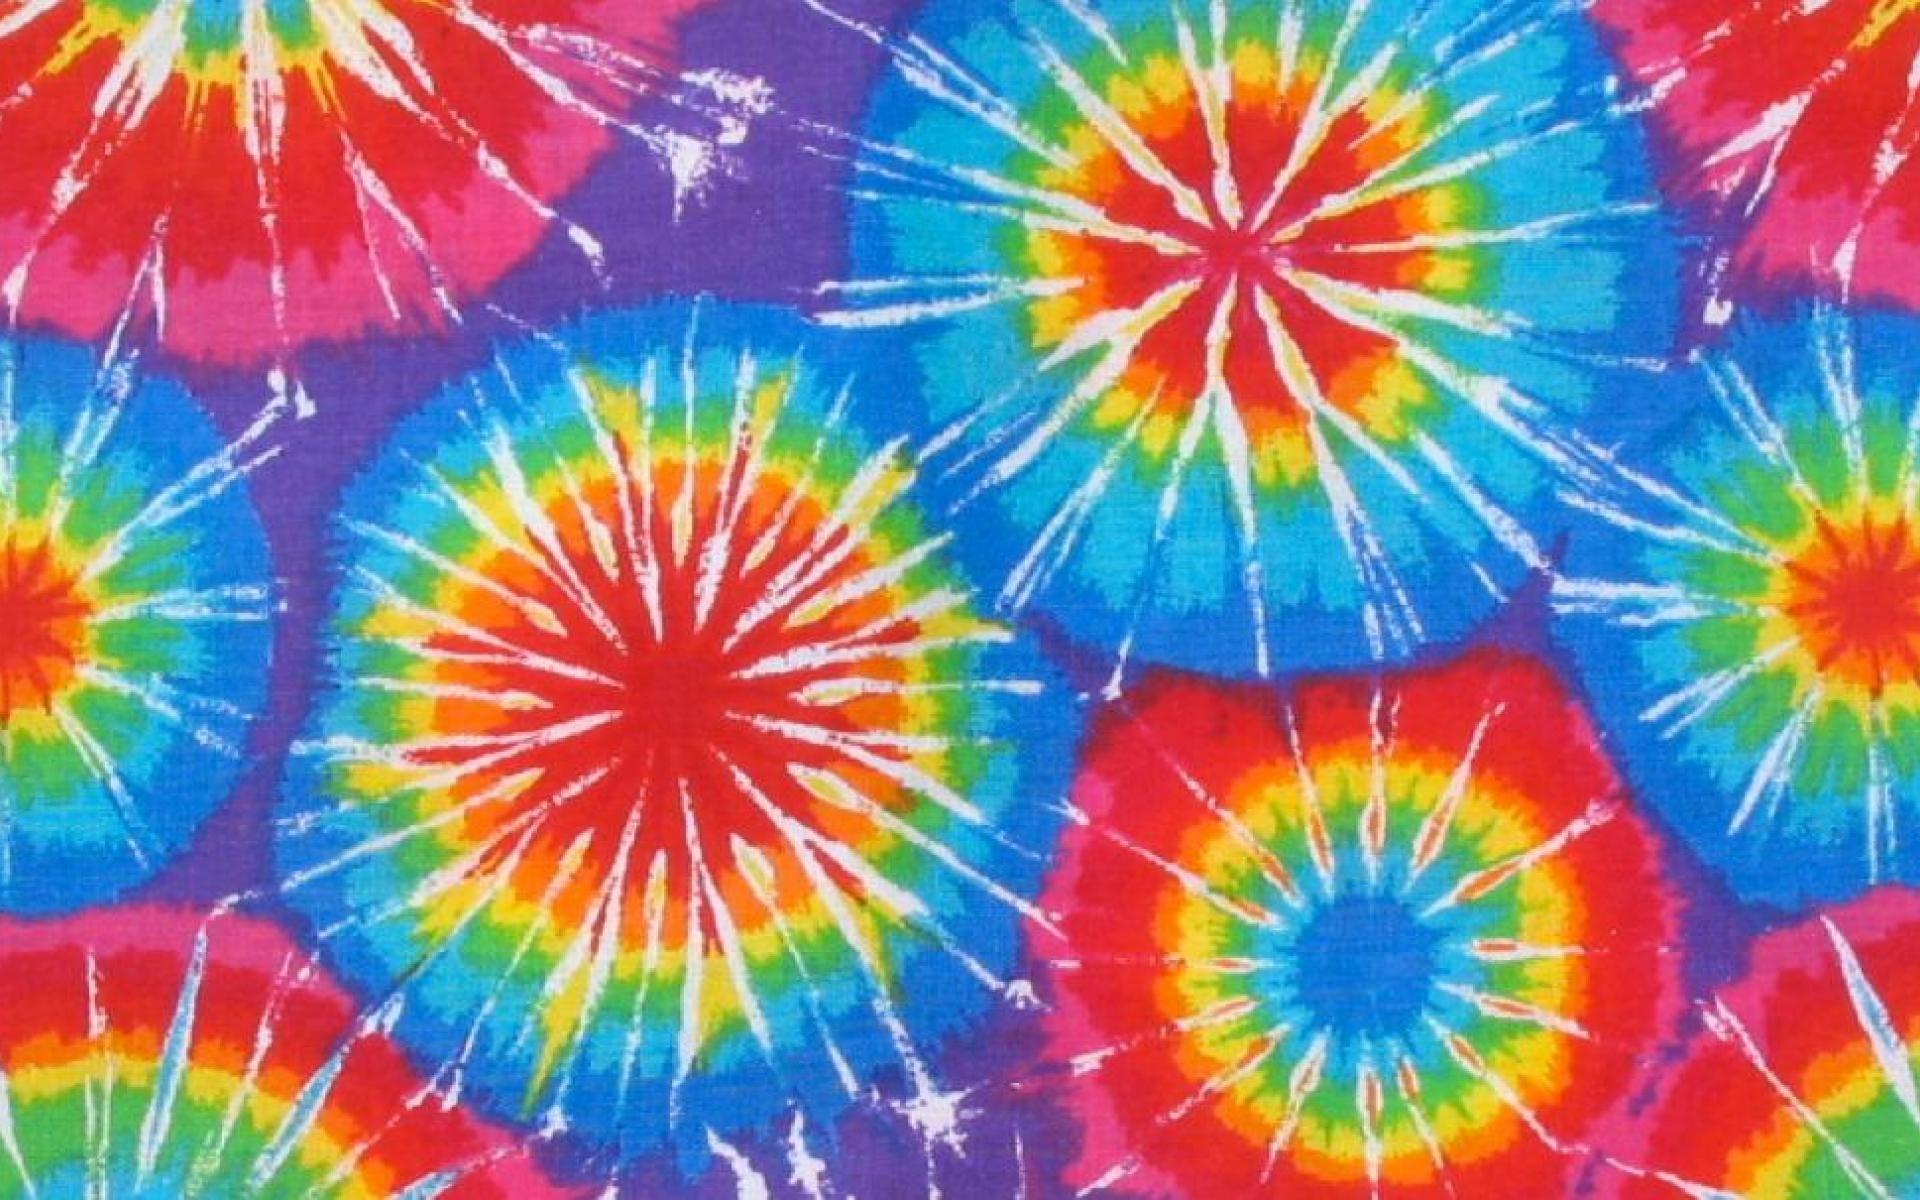 Tie Dye Wallpaper 52 images 1920x1200